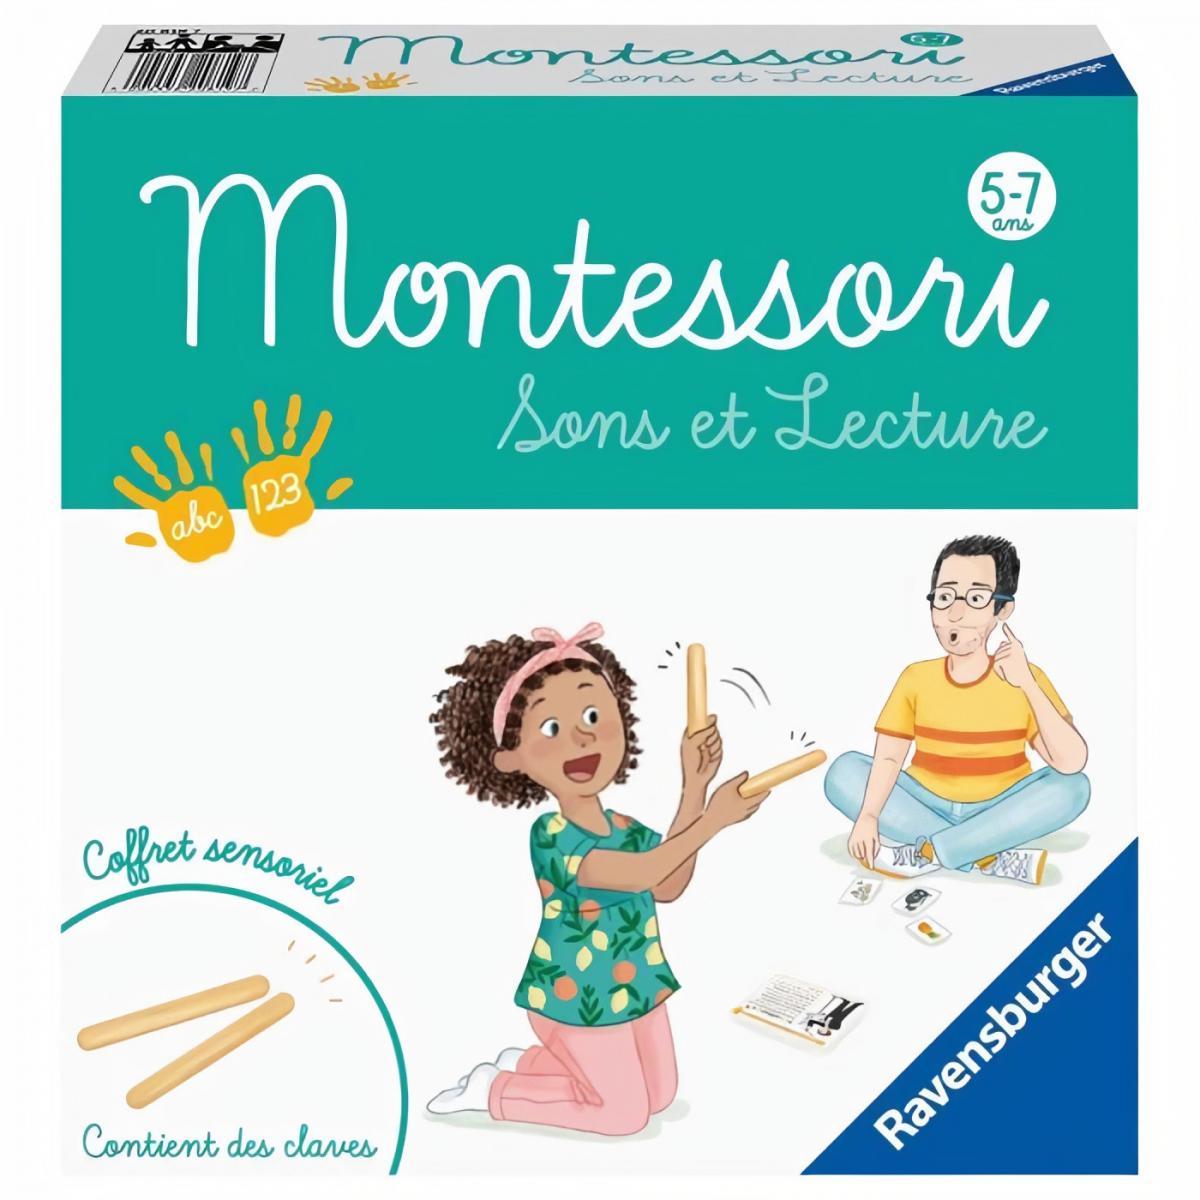 Ravensburger Ravensburger - Montessori - Sons et Lecture - 4005556208197